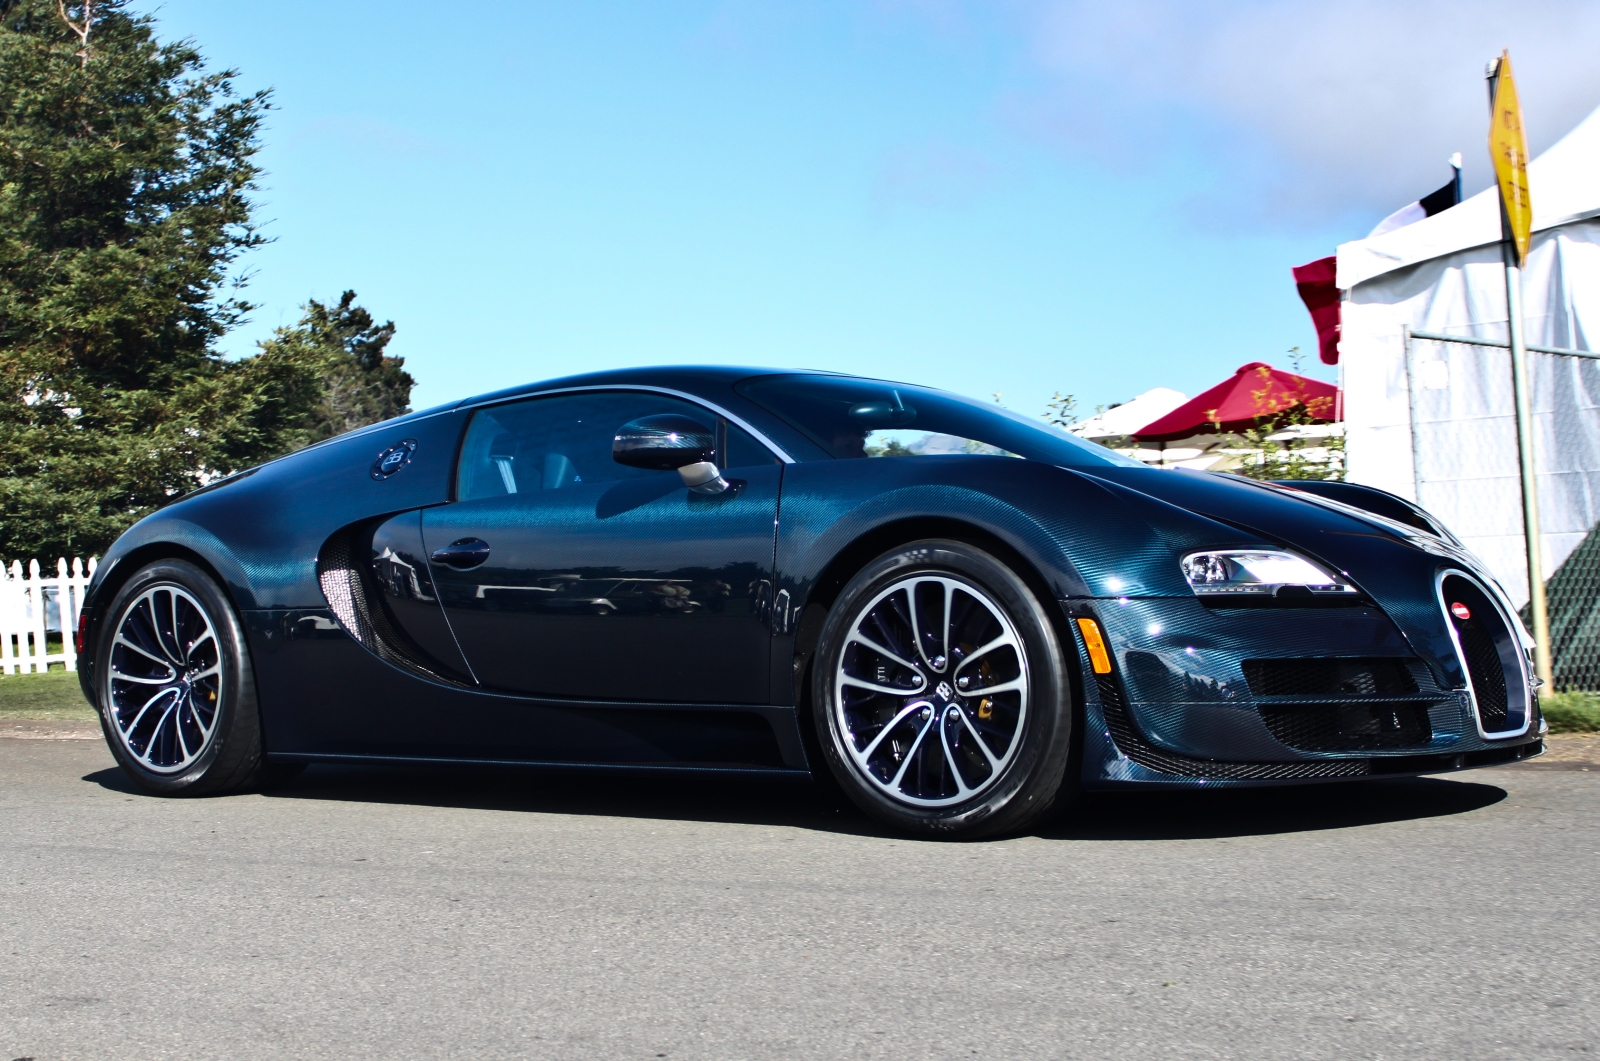 http://3.bp.blogspot.com/-4BX2EEpsi6c/UCU7XkKjOBI/AAAAAAAAAKI/CN4xe3XSf0o/s1600/bugatti-veyron-blue+3.jpg